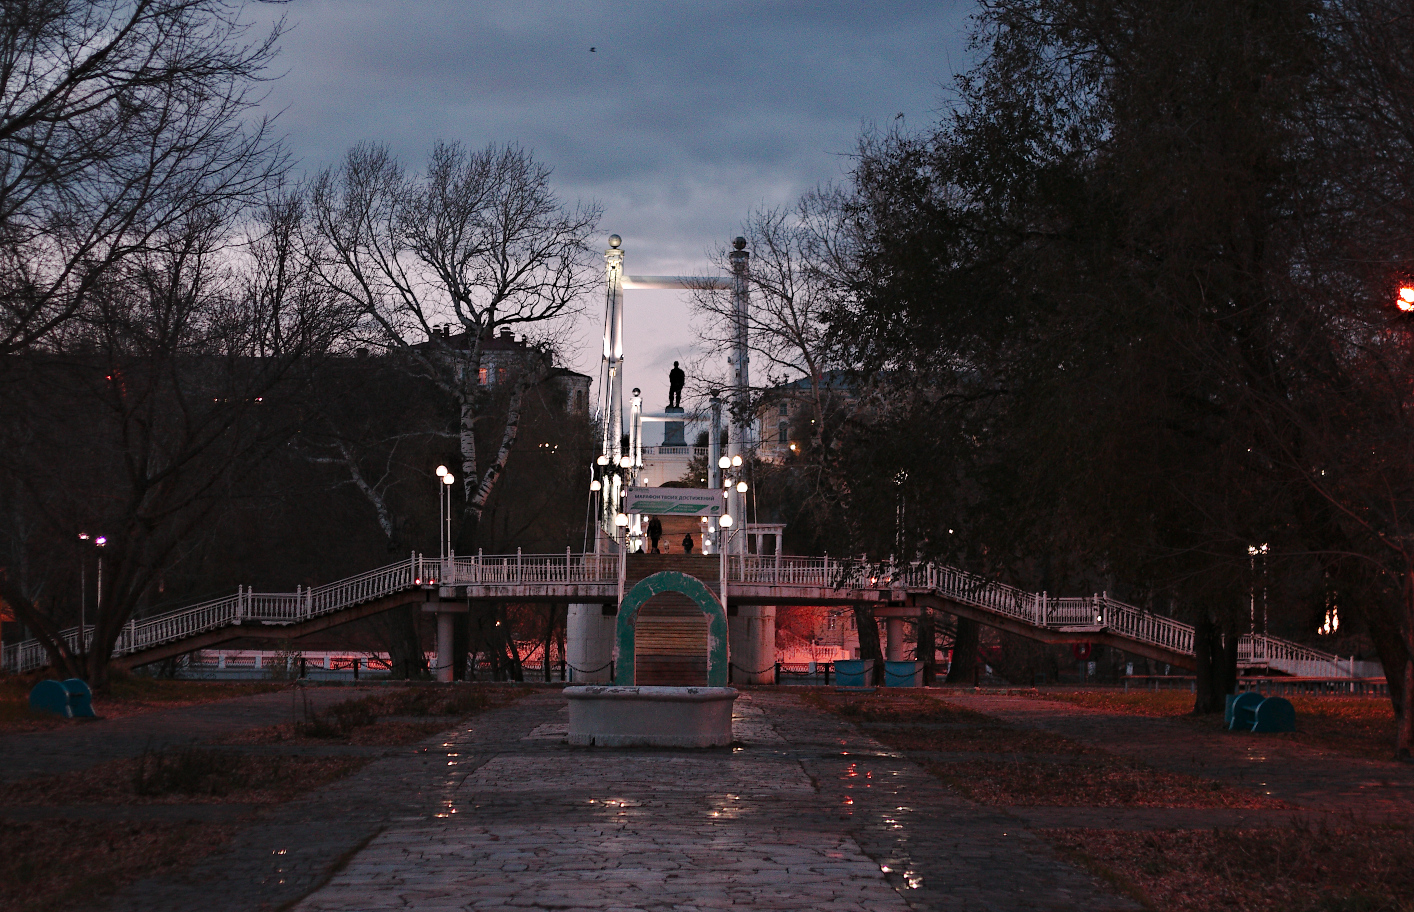 могла оренбург фото ночью тогда